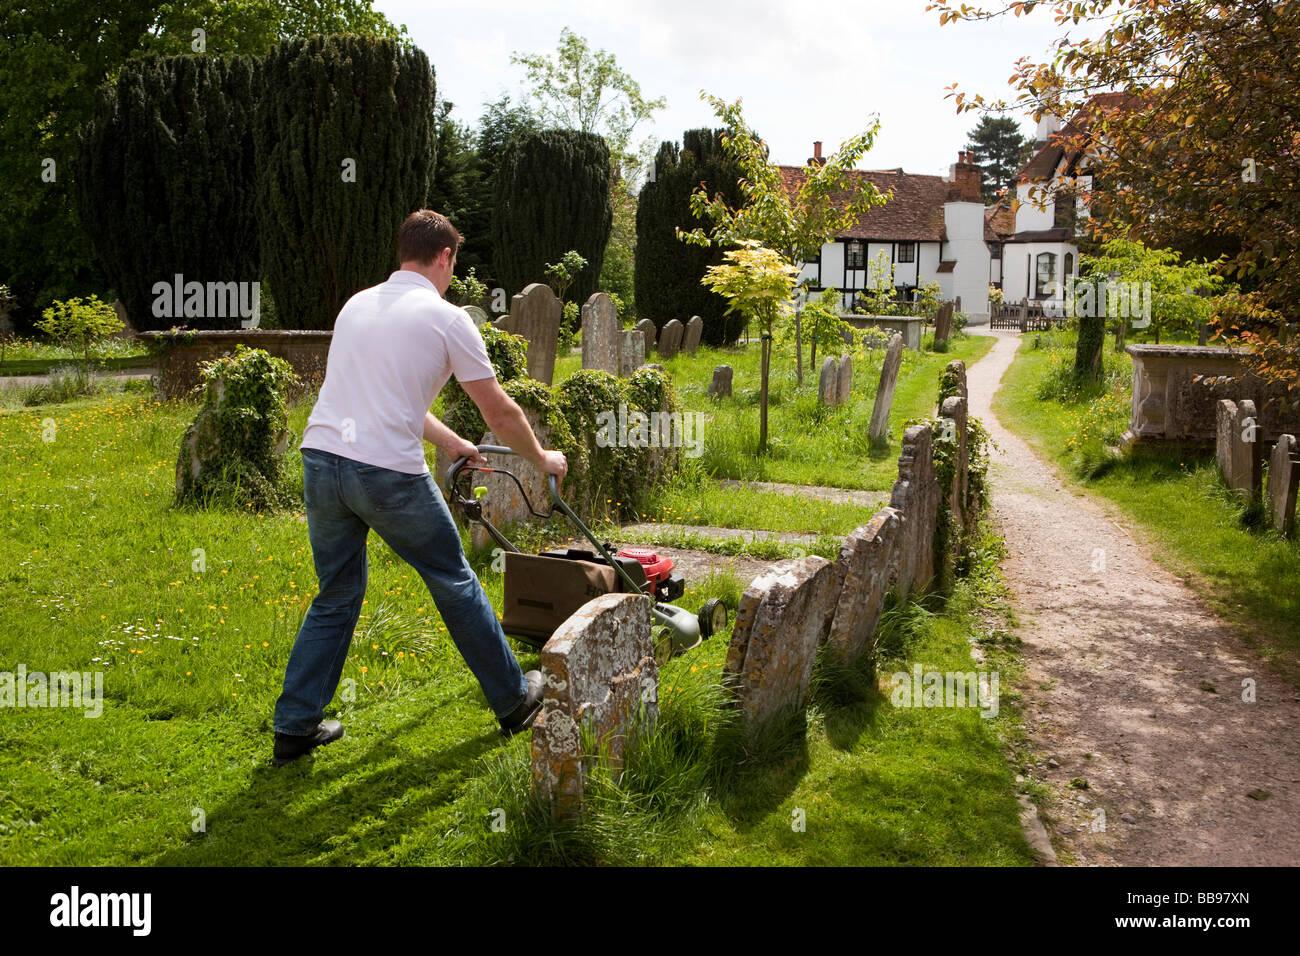 England Berkshire Cookham Holy Trinity Parish Churchyard man mowing graveyard grass with lawn mower - Stock Image